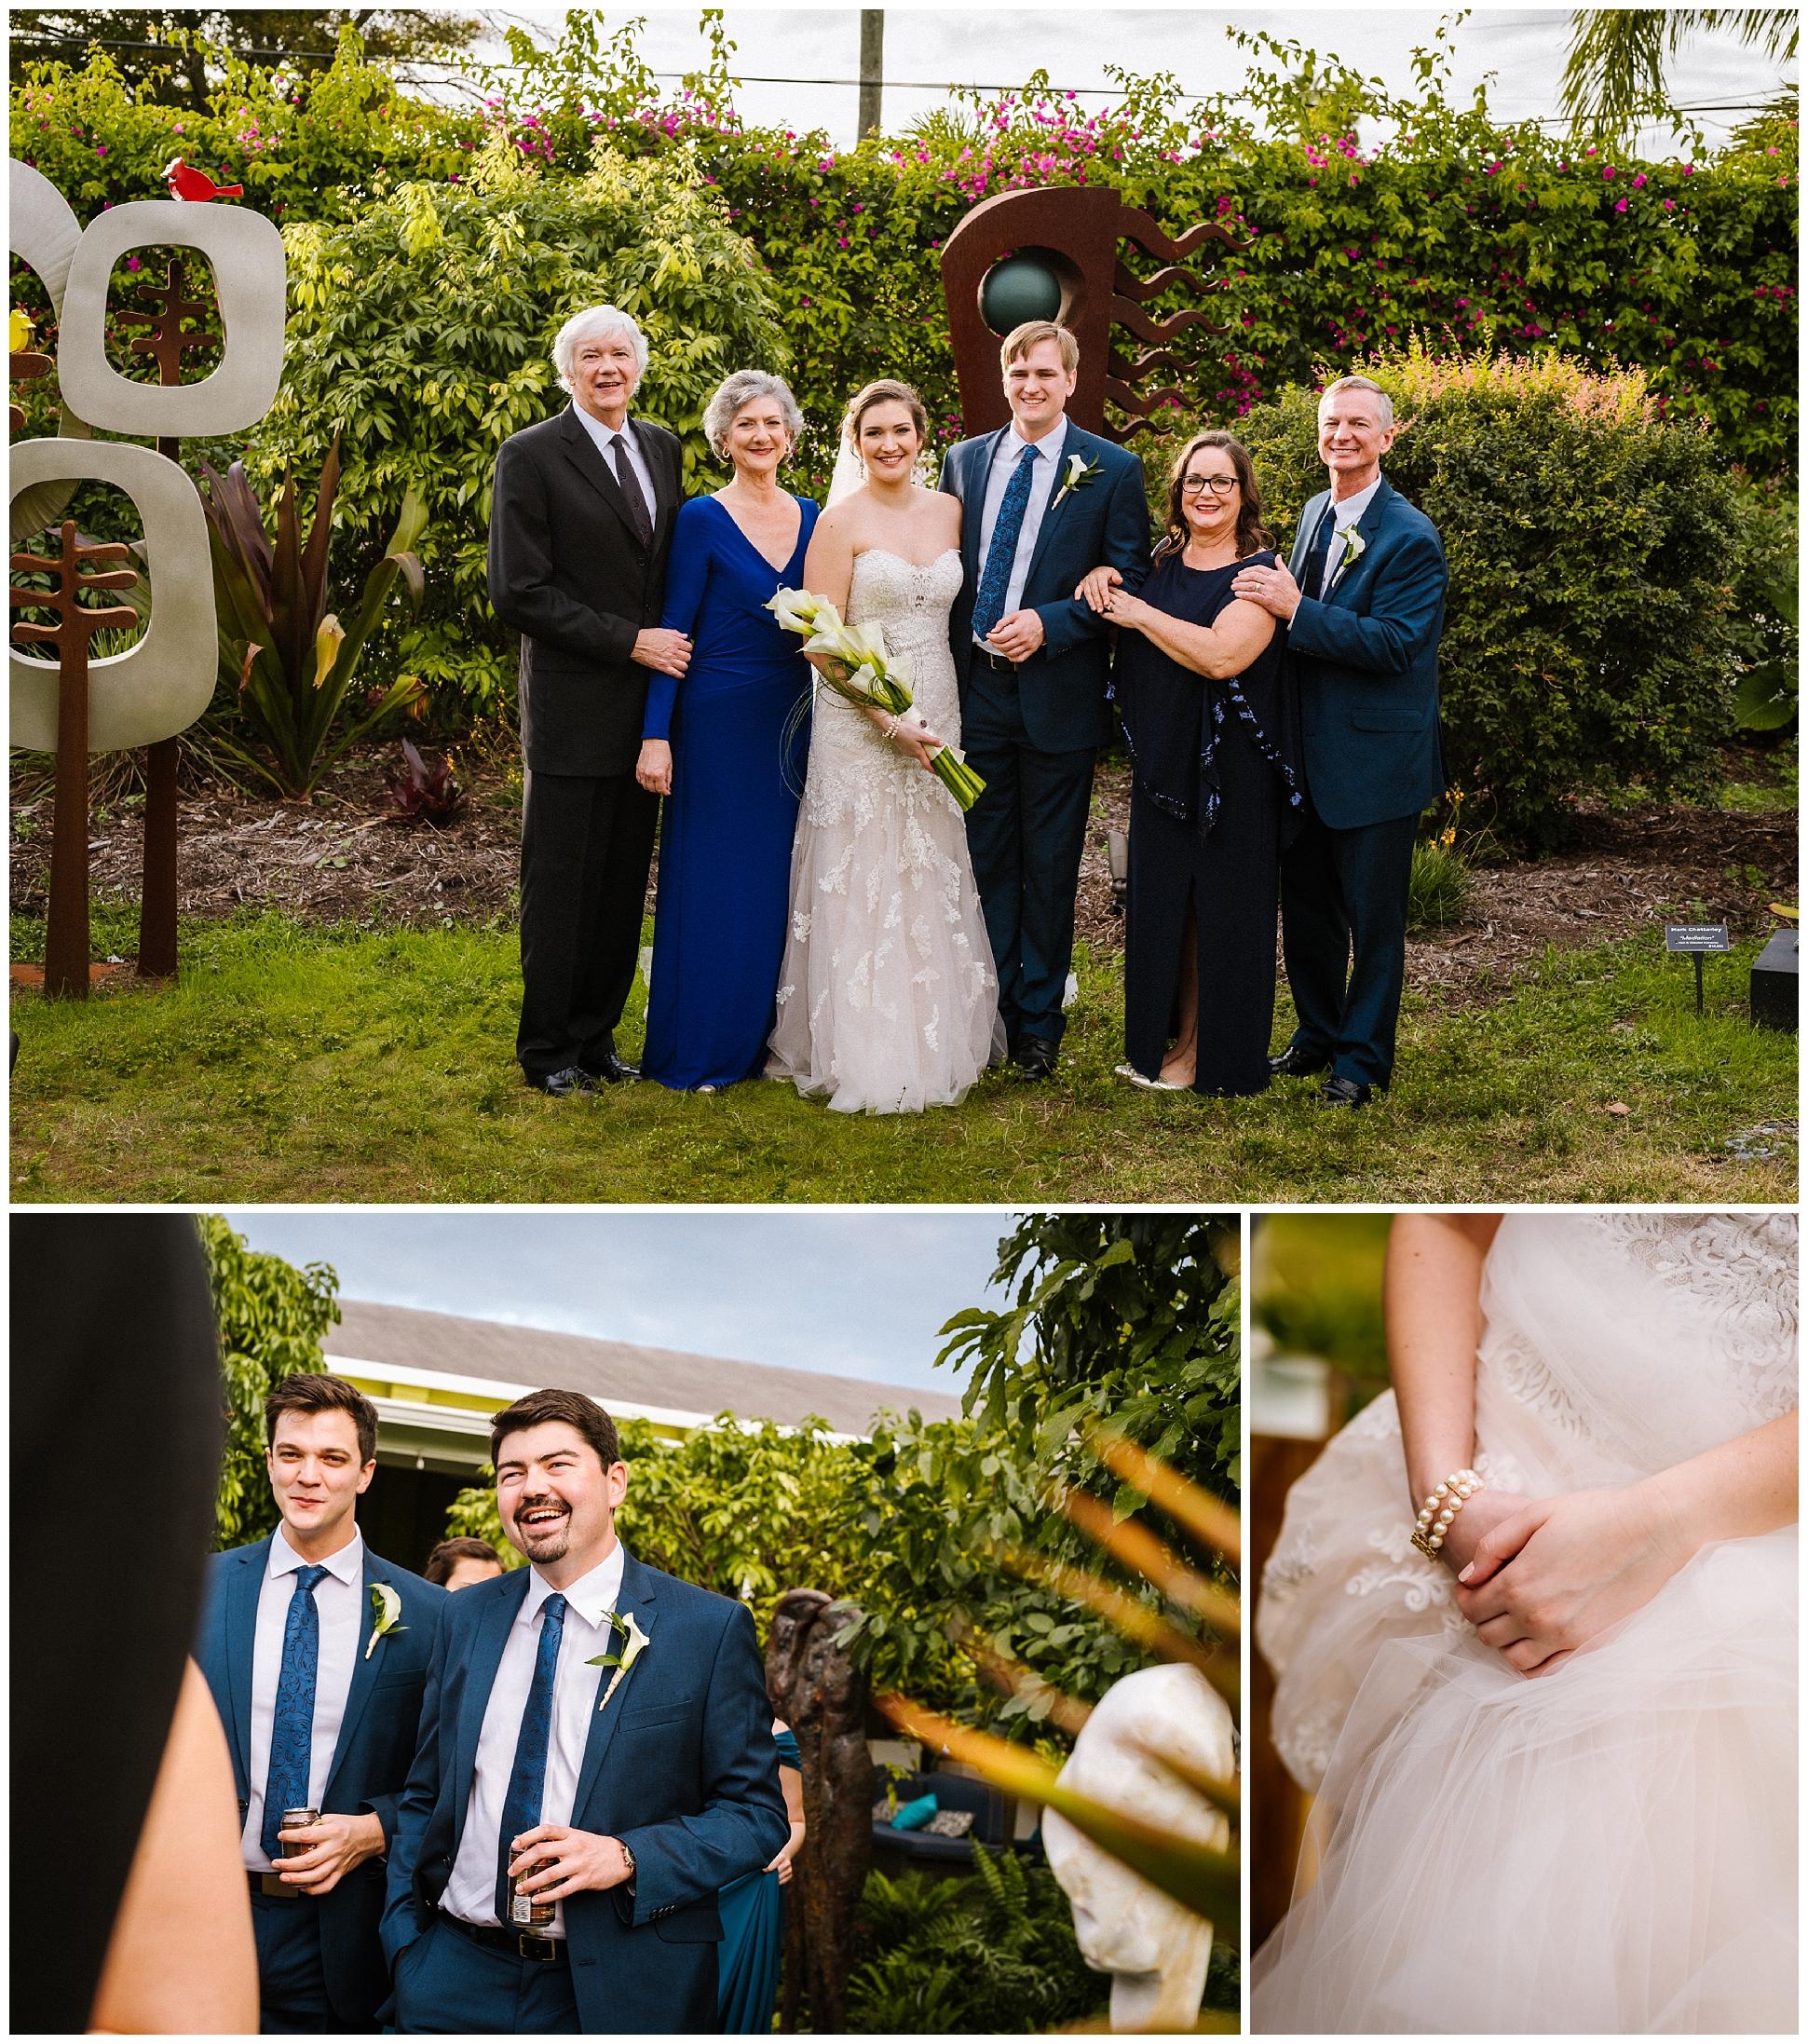 St-pete-wedding-photography-unique-glass-blowing-gallery-succulent-art_0017.jpg